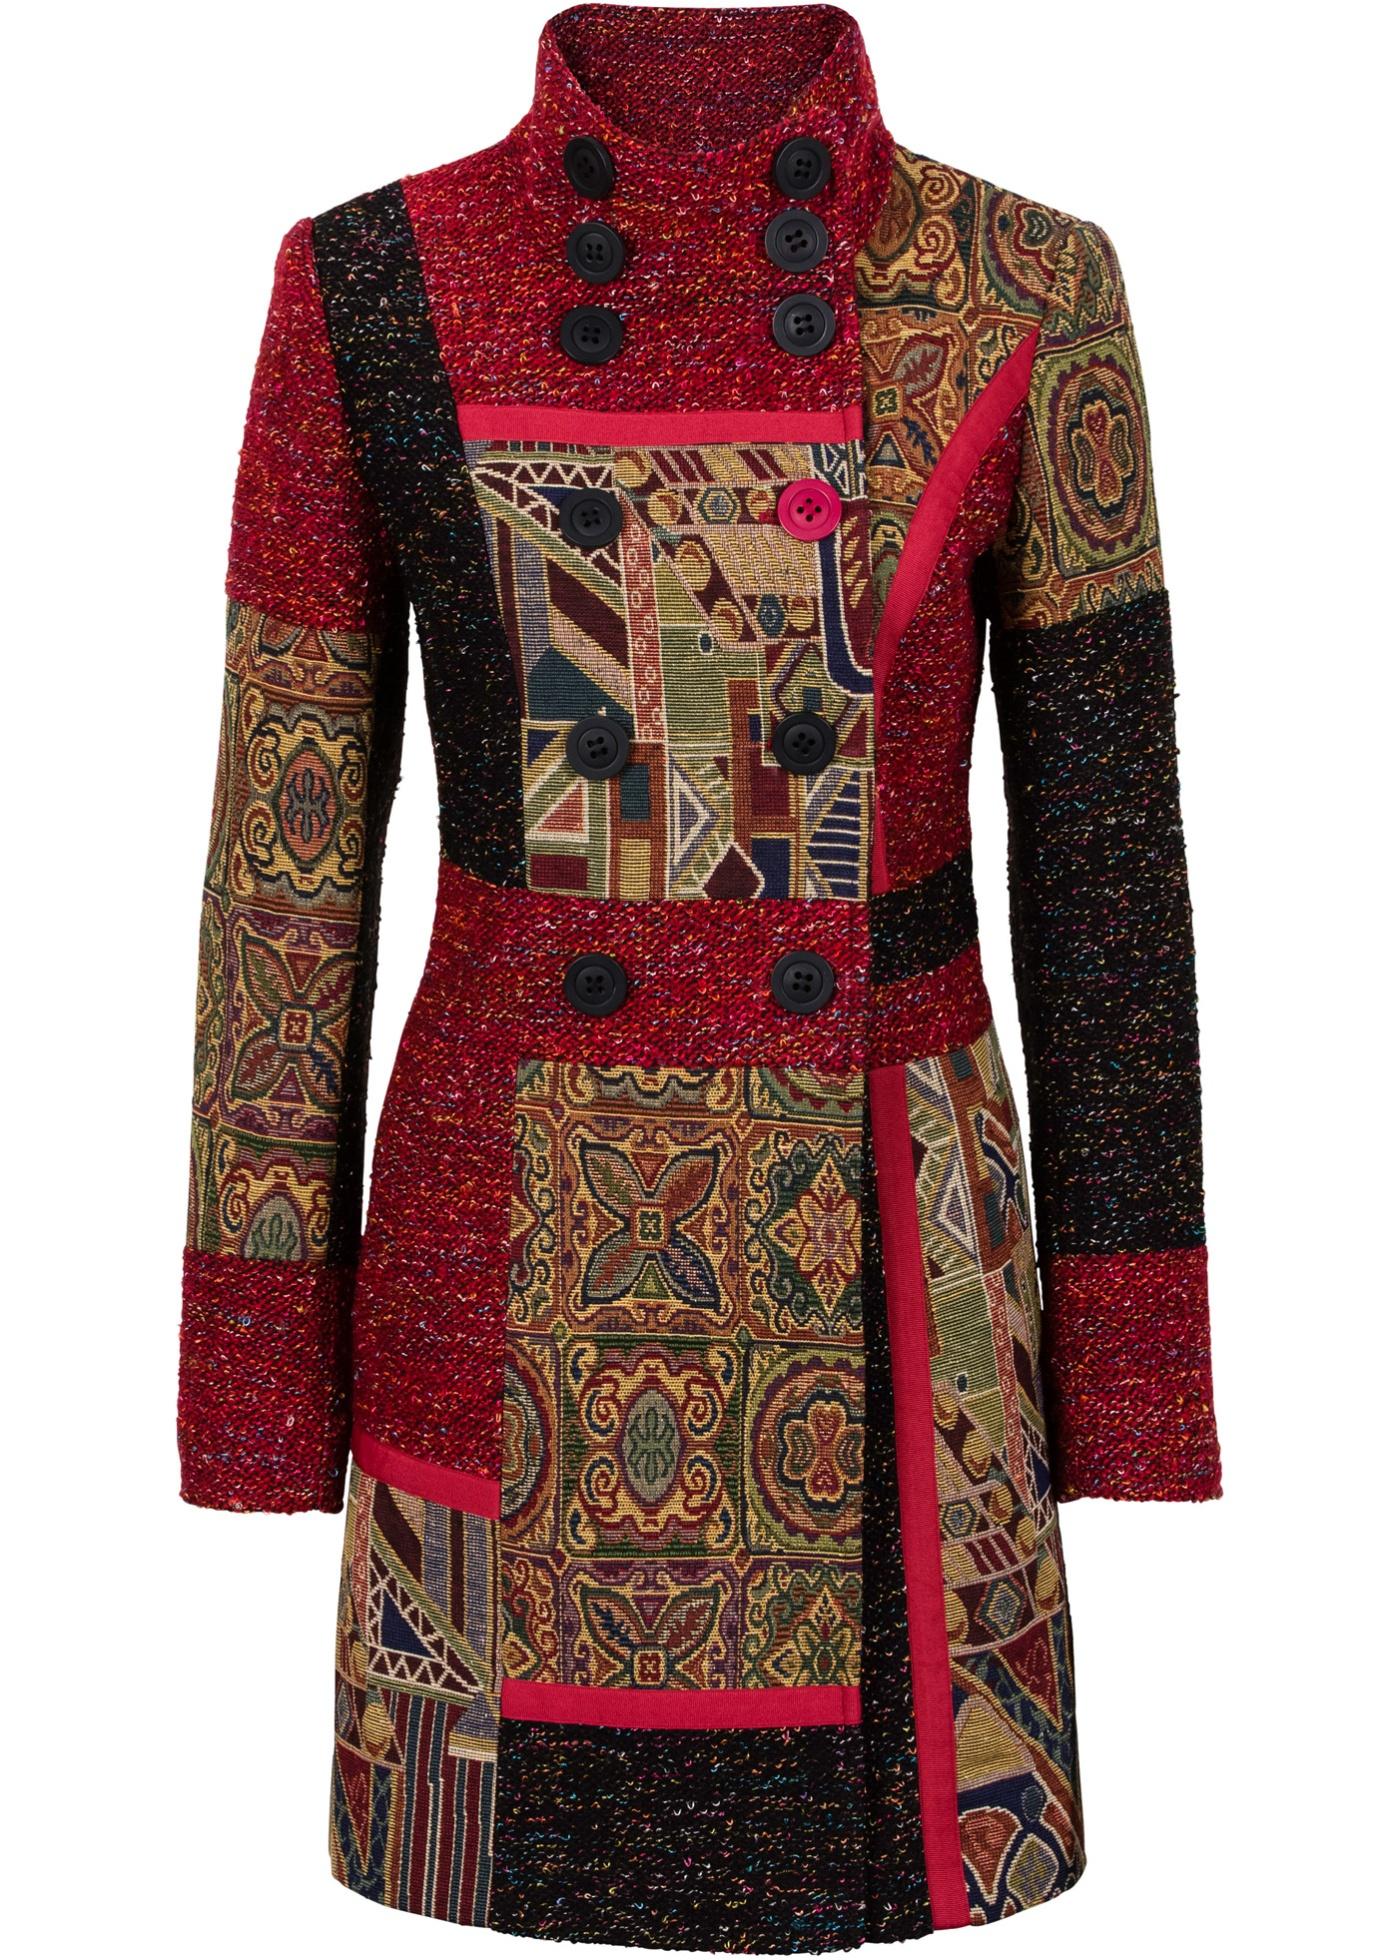 Manteau multi-mati?re et motif